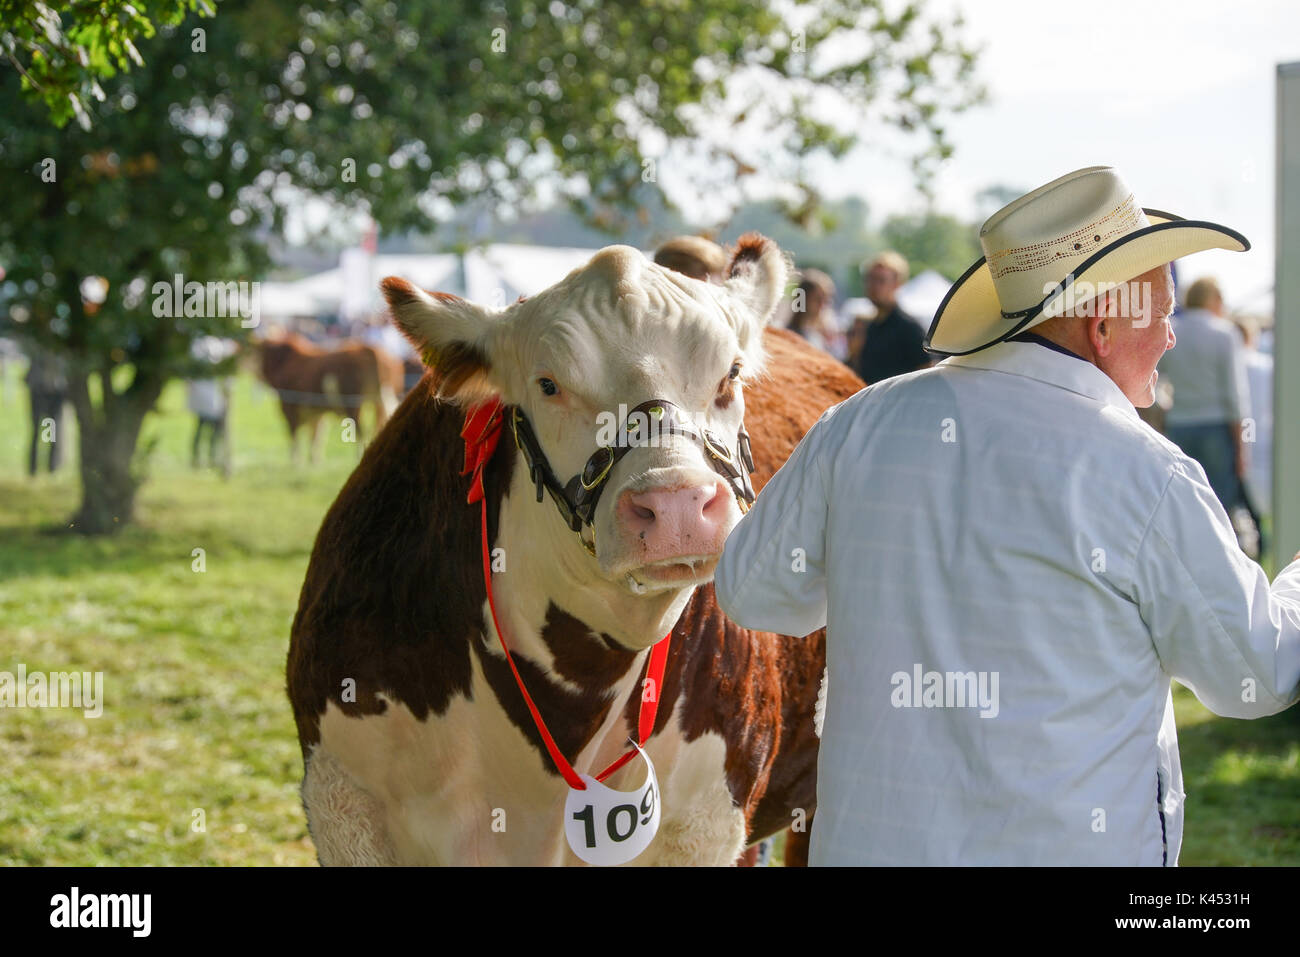 Les bucks country show Photo Stock